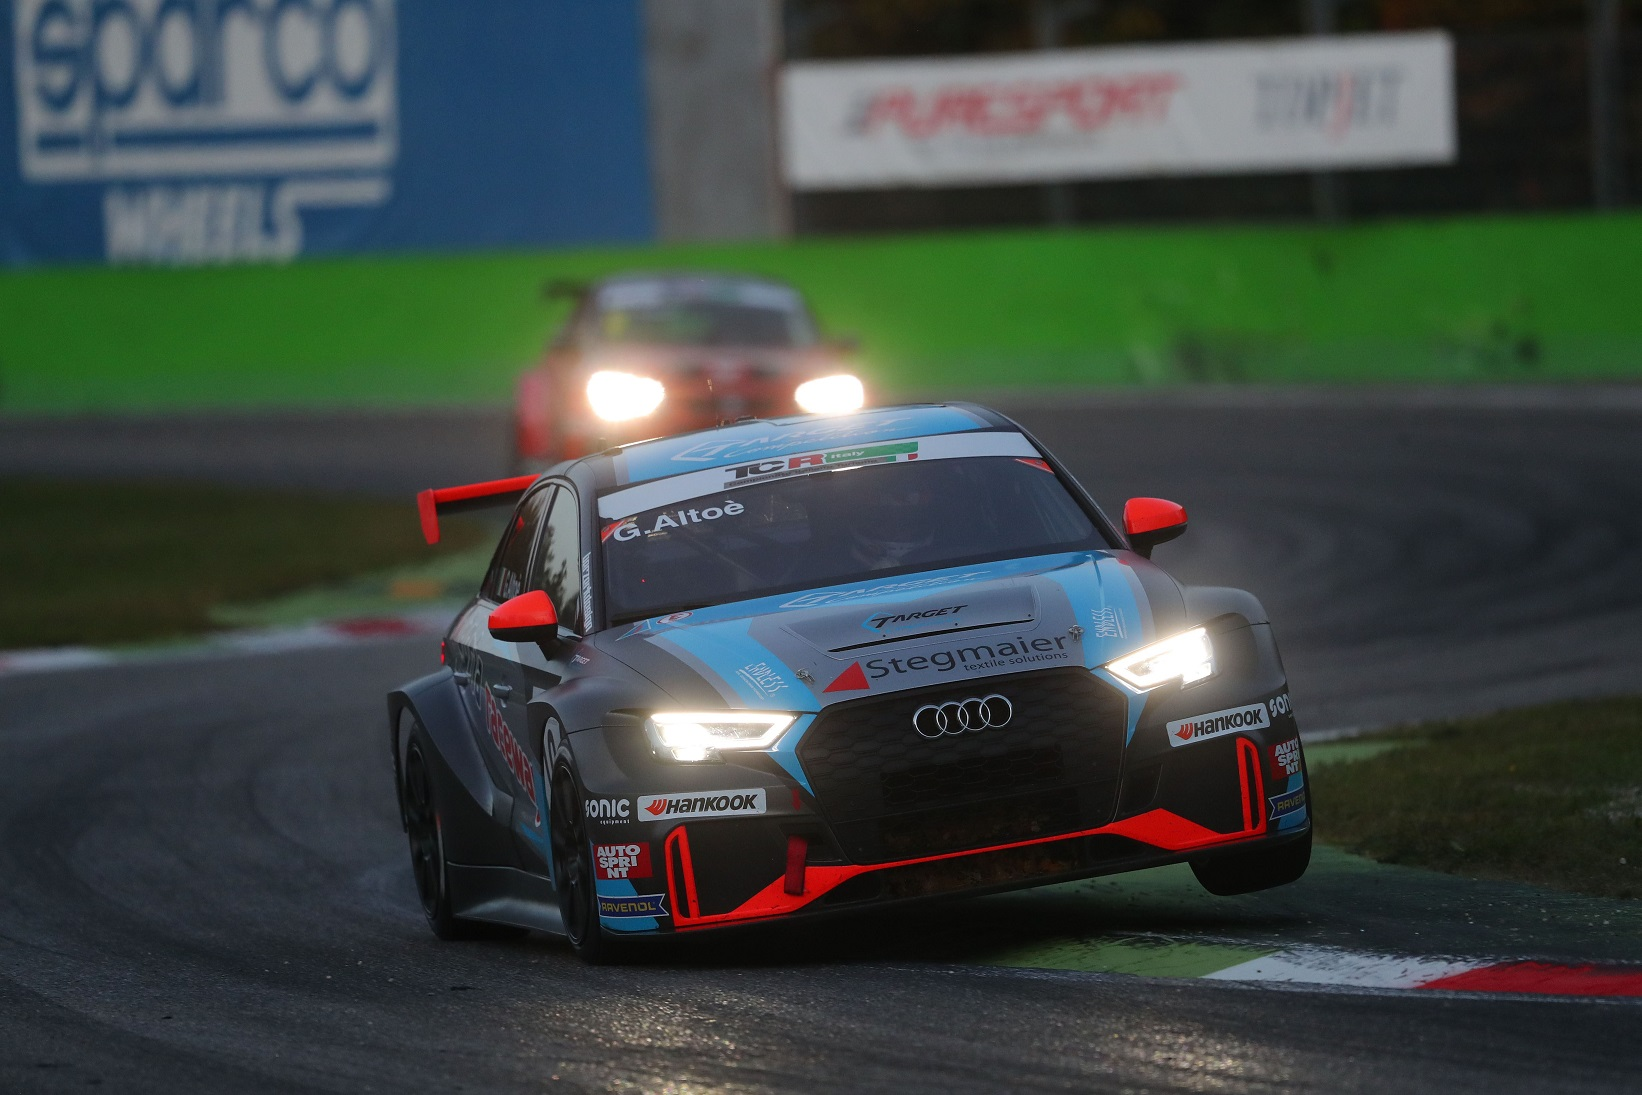 Giacomo Altoè (Target Srl,Audi RS3 LMS TCR #10)